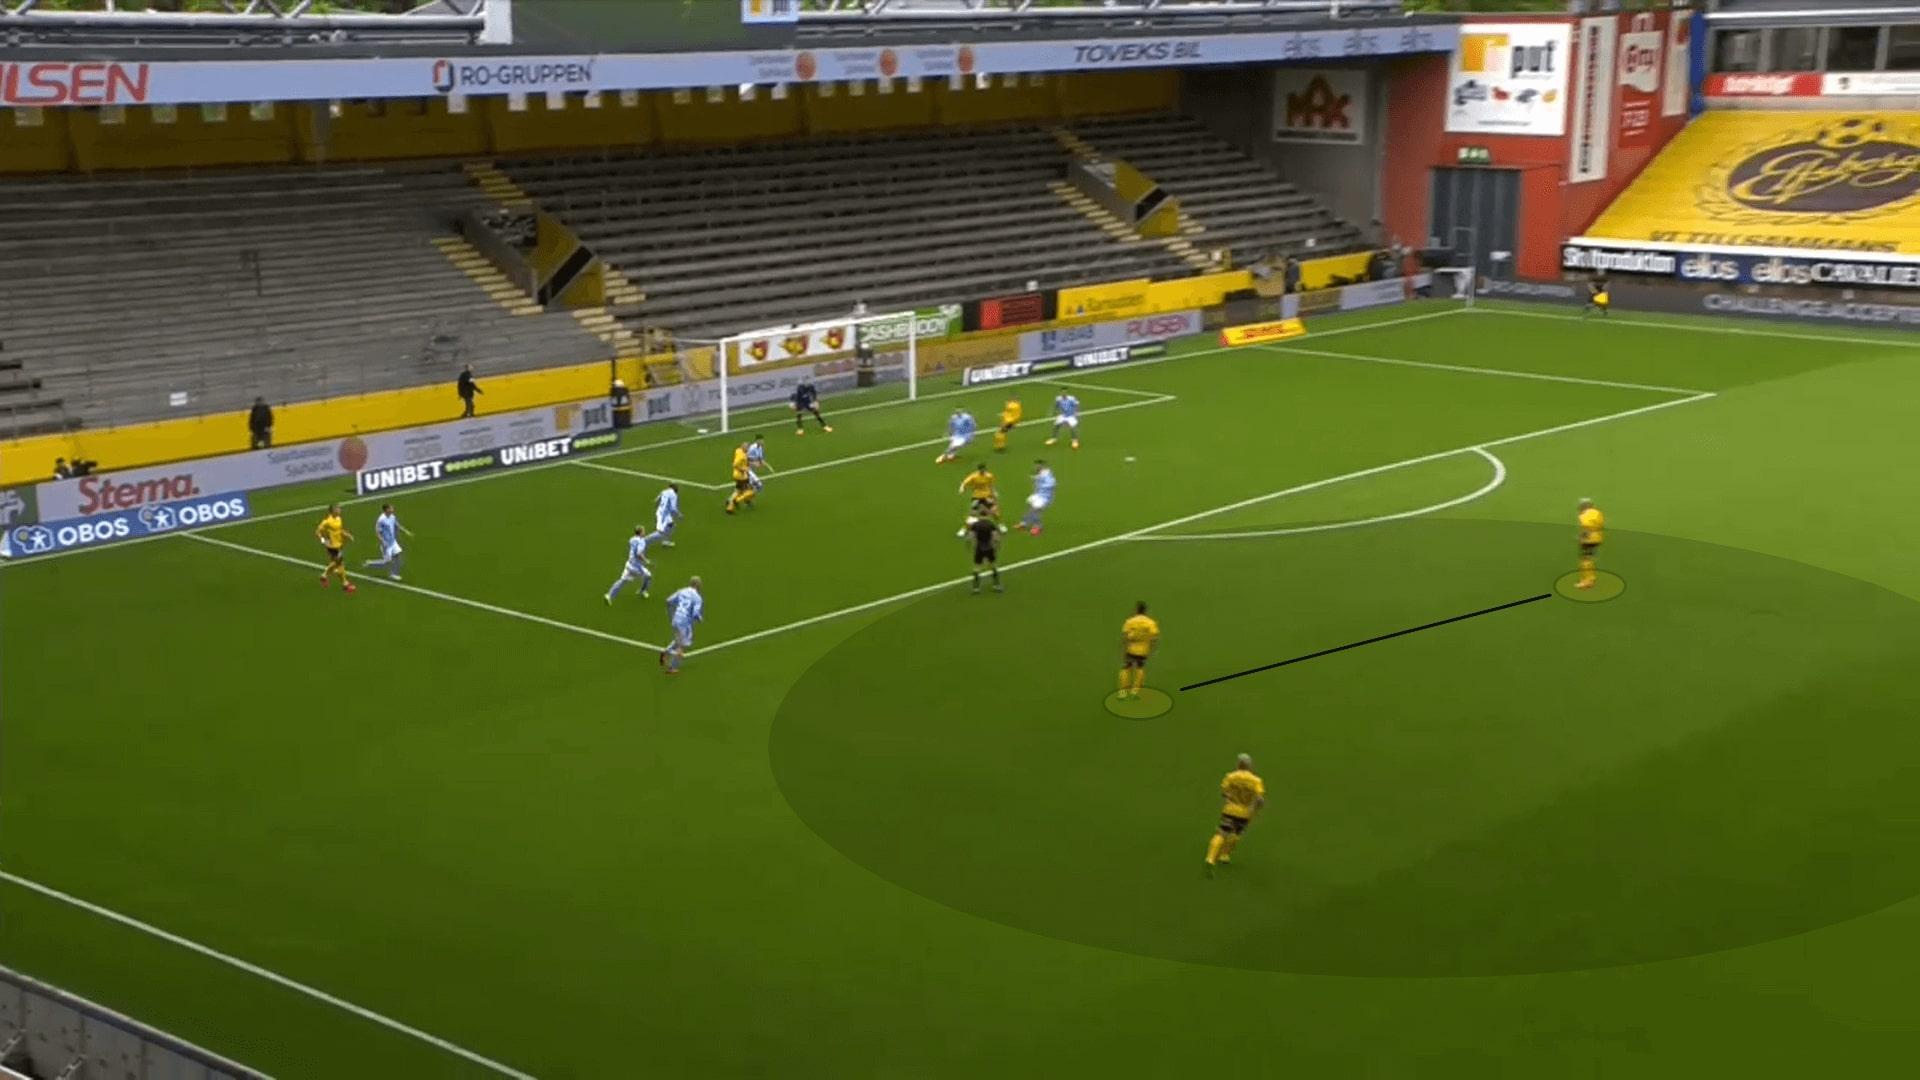 Allsvenskan 2020: Elfsborg vs Malmo FF - tactical analysis tactics